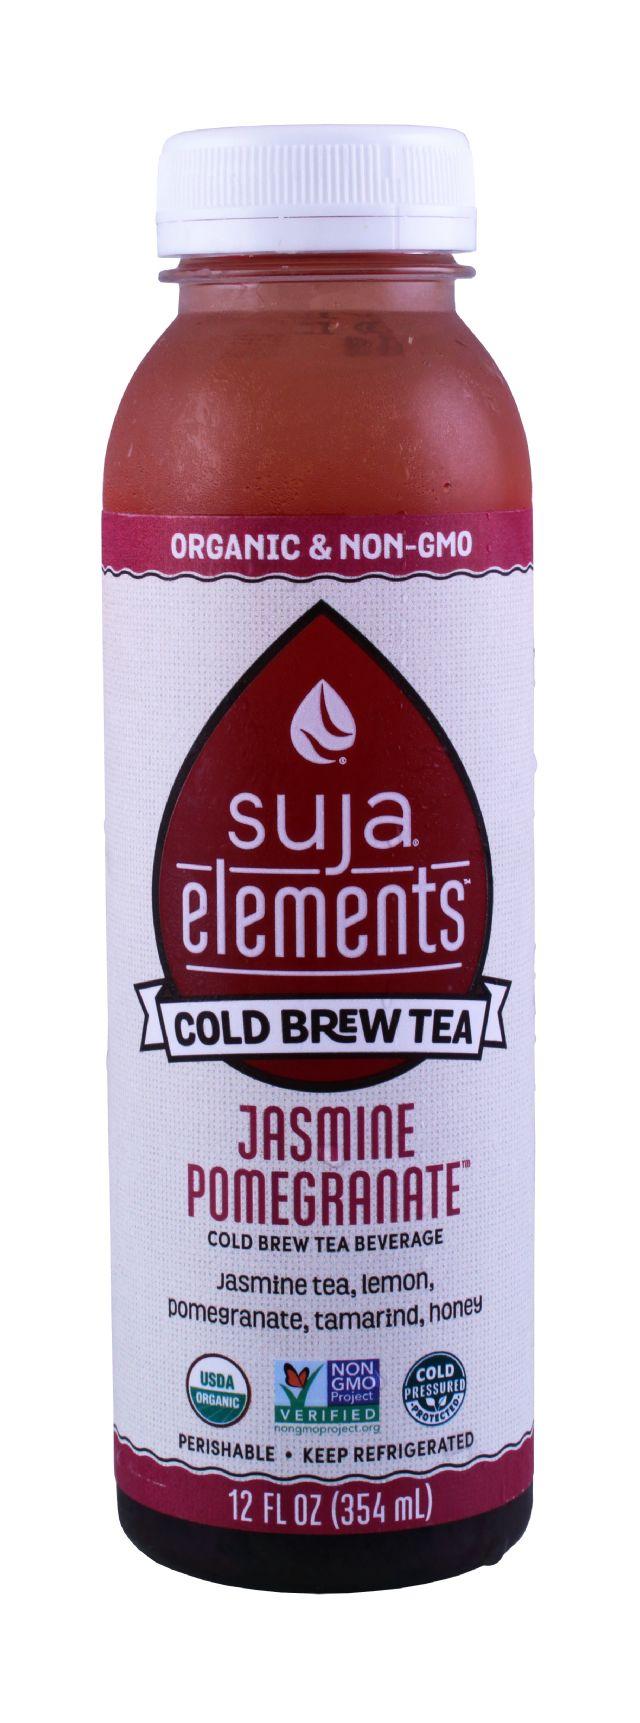 Suja Elements Cold Brew Tea: Suja JasminePom Front